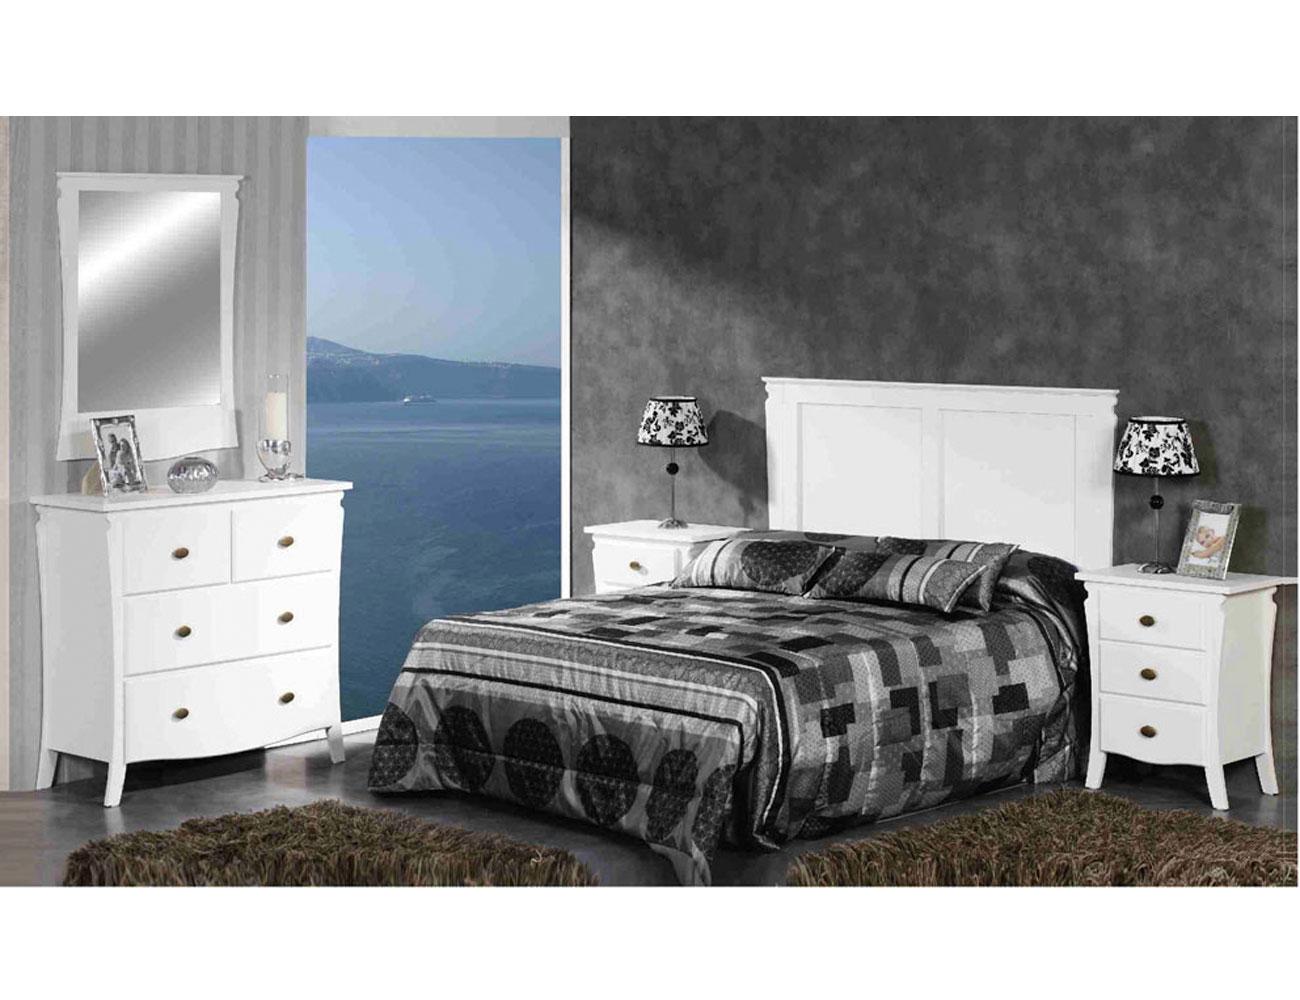 Dormitorio matrimonio blanco lacado madera dm8